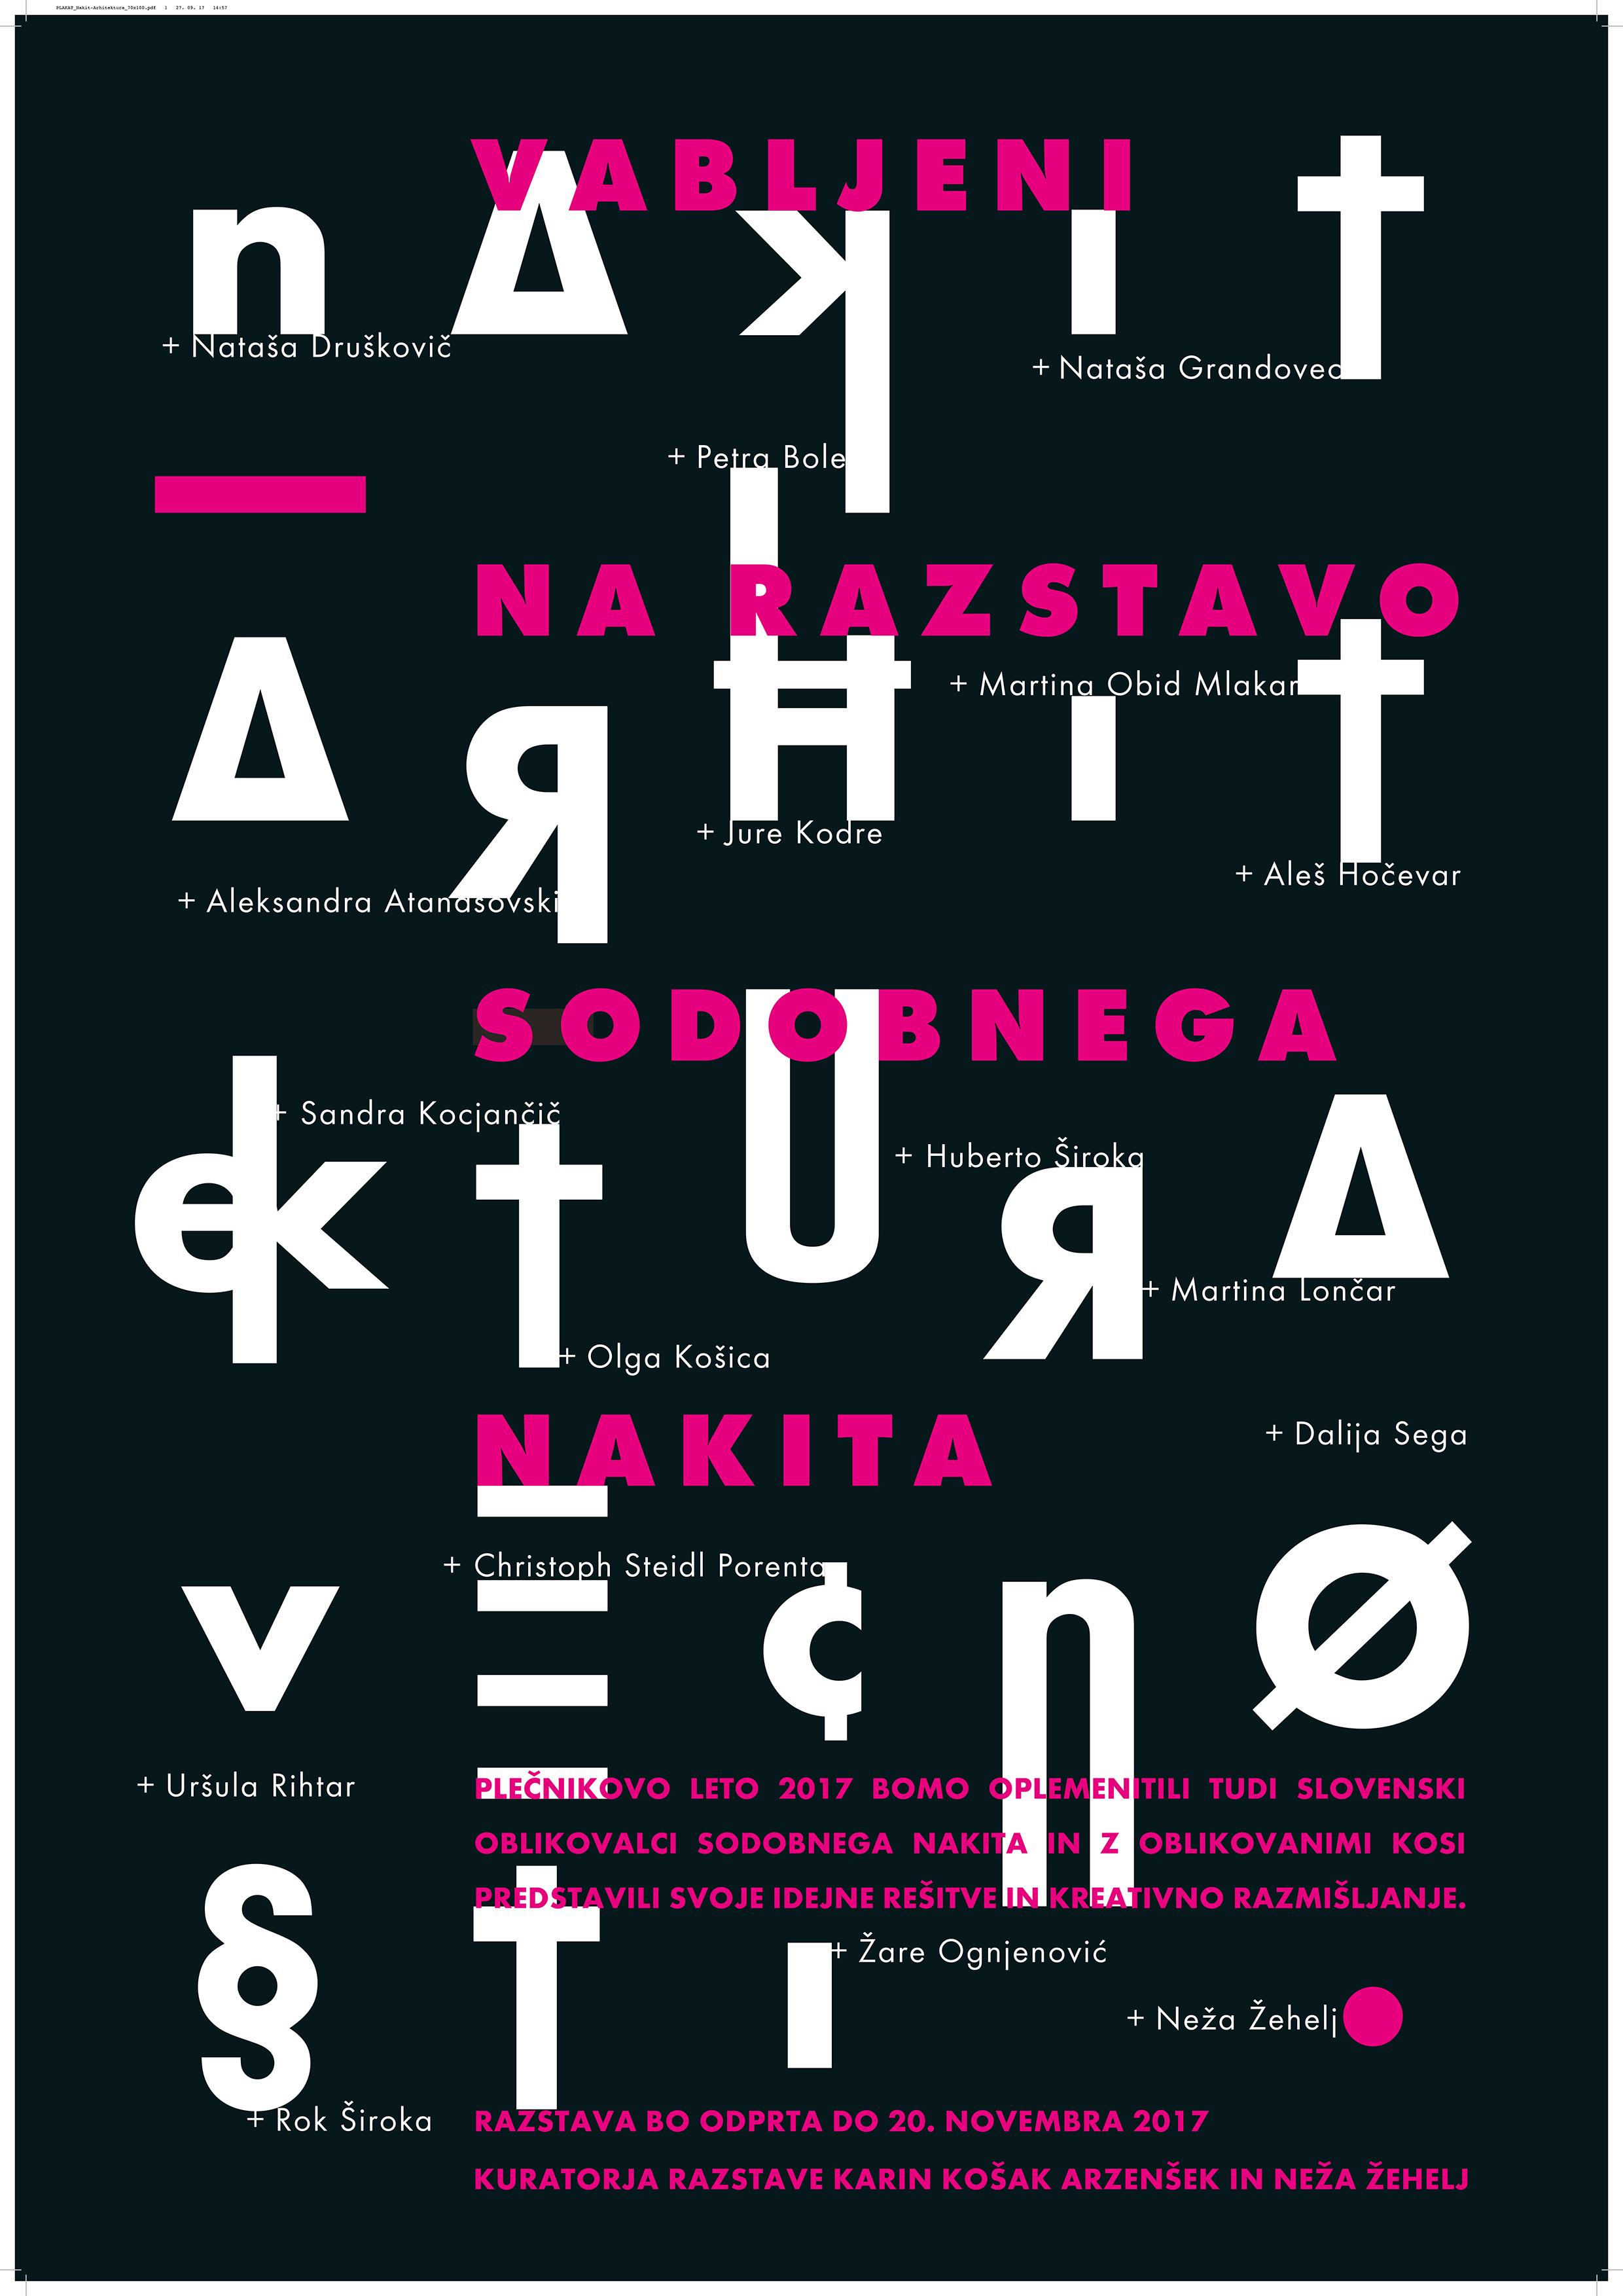 Infinitive architecture - jewellery - Feniks Gallery / Ljubljana / Slovenia12. October - 20. November